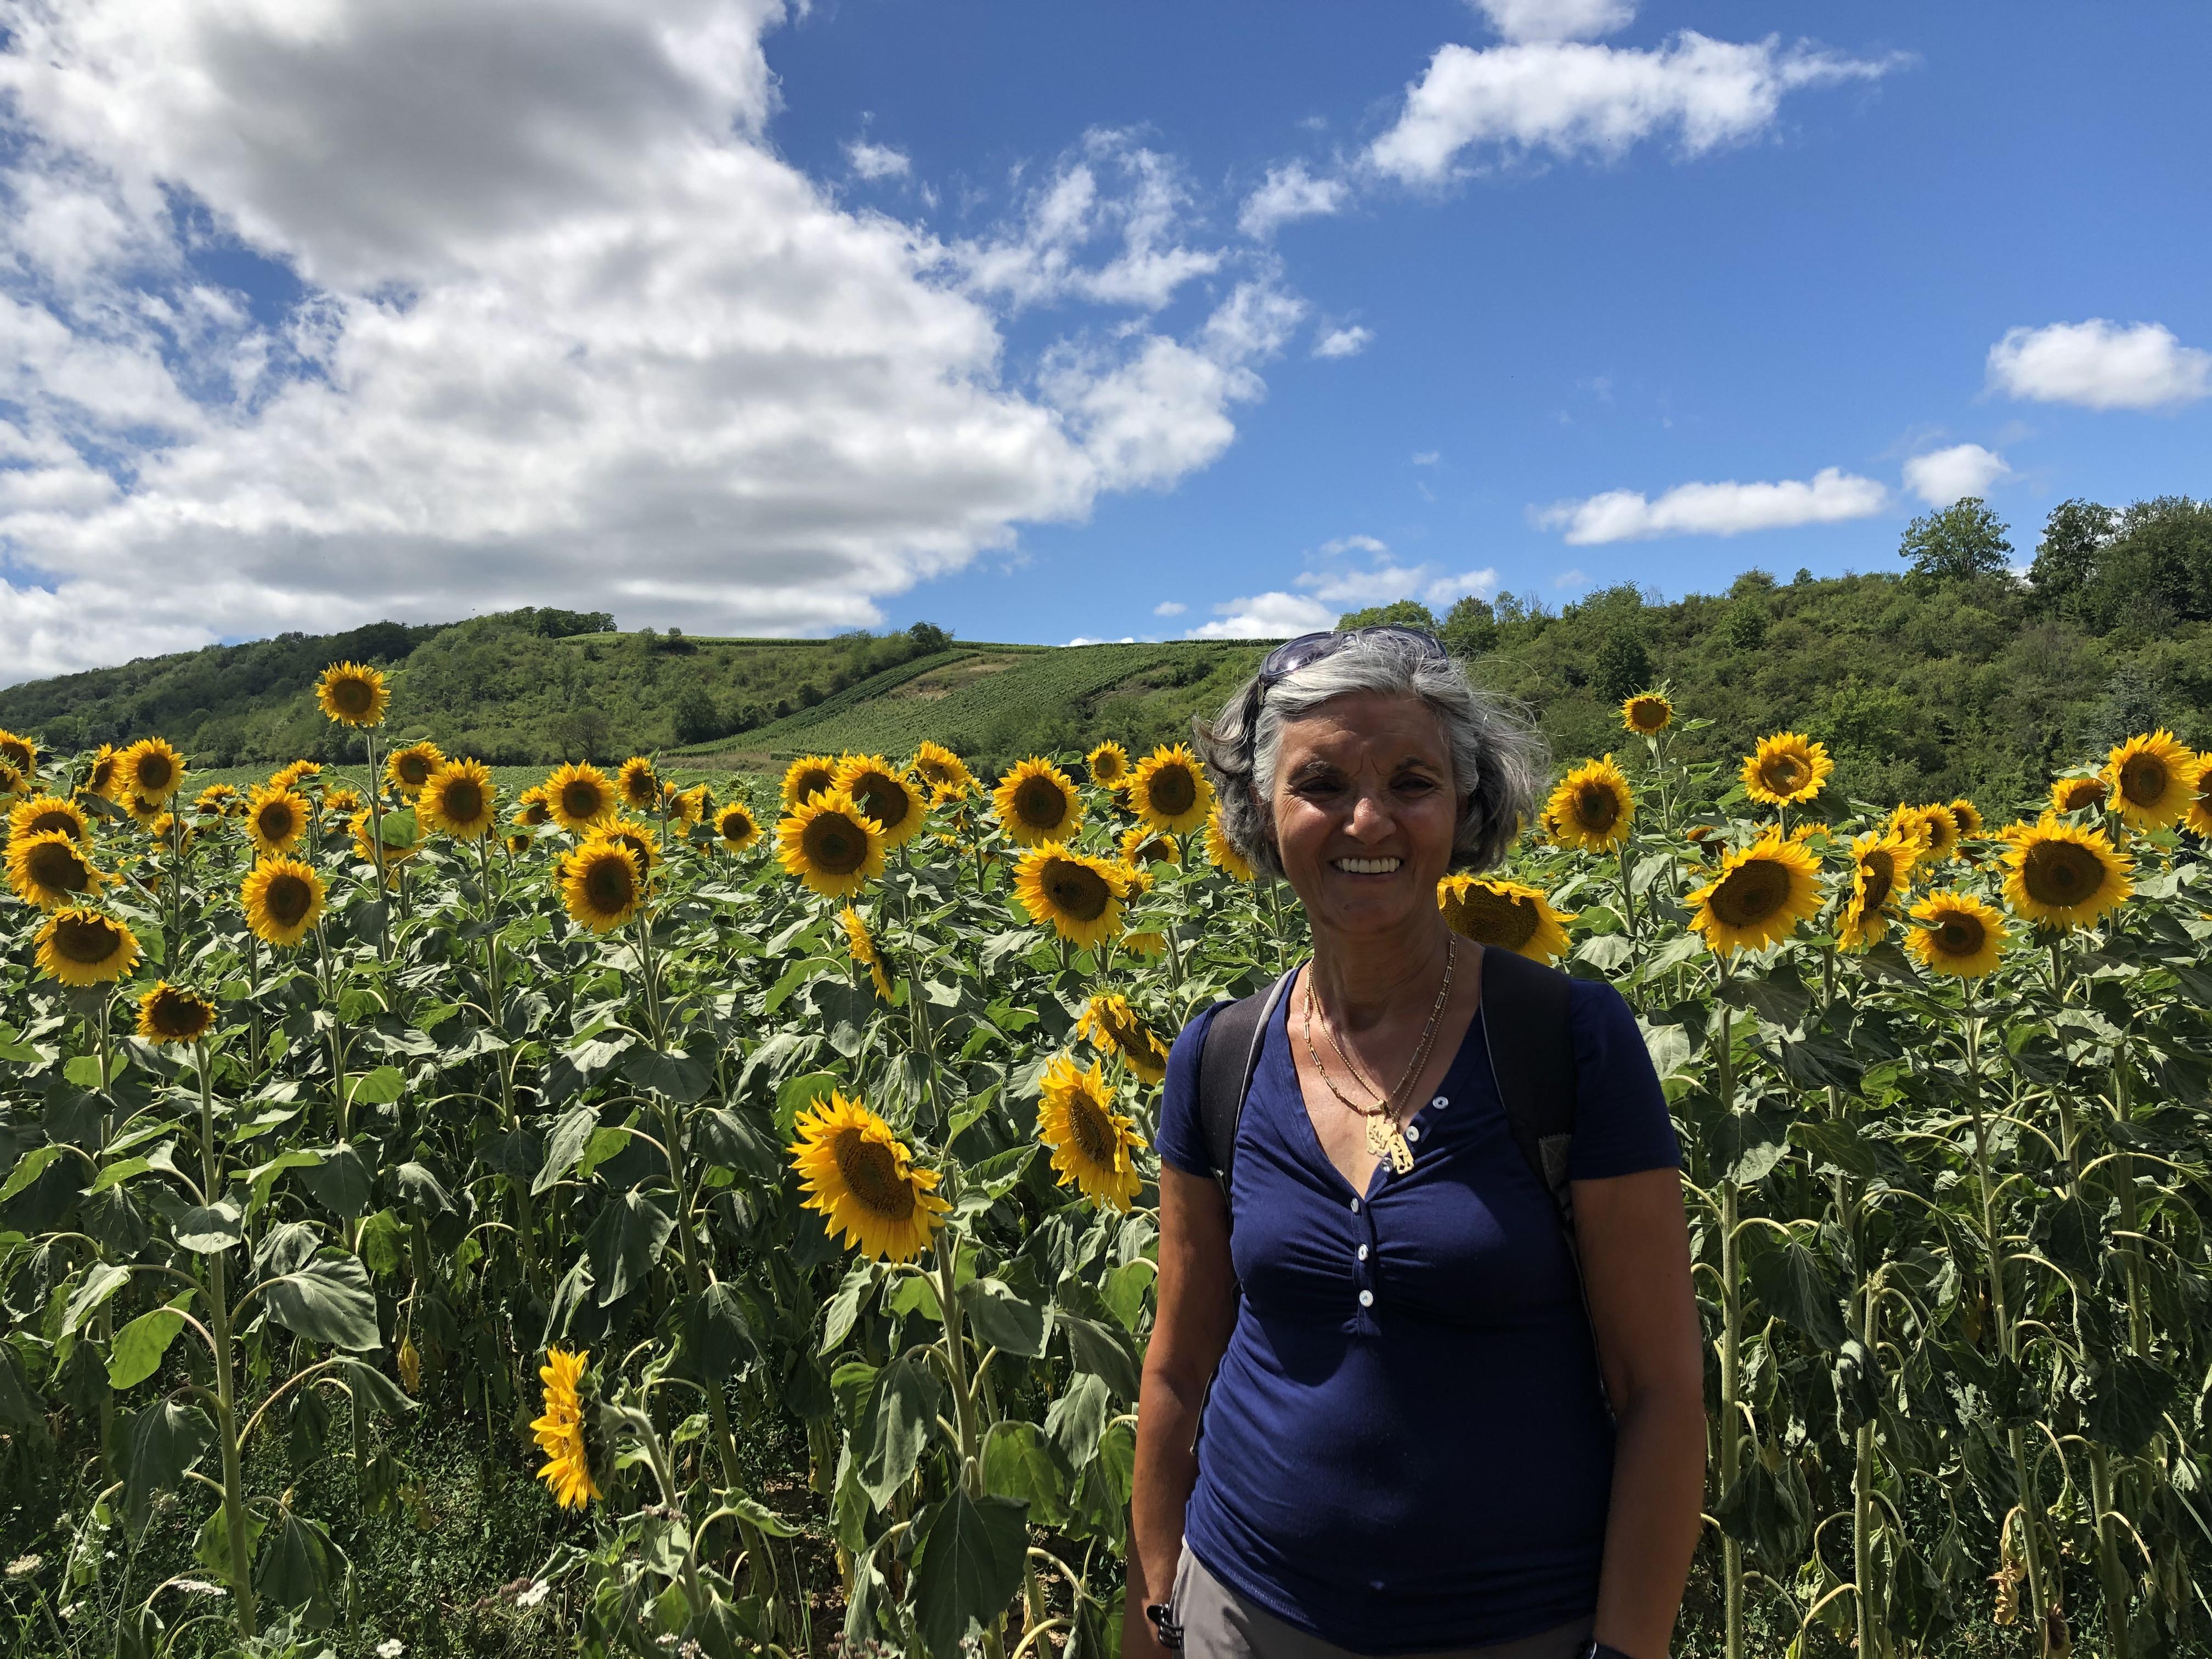 Monique Bienmuller standing in nature.